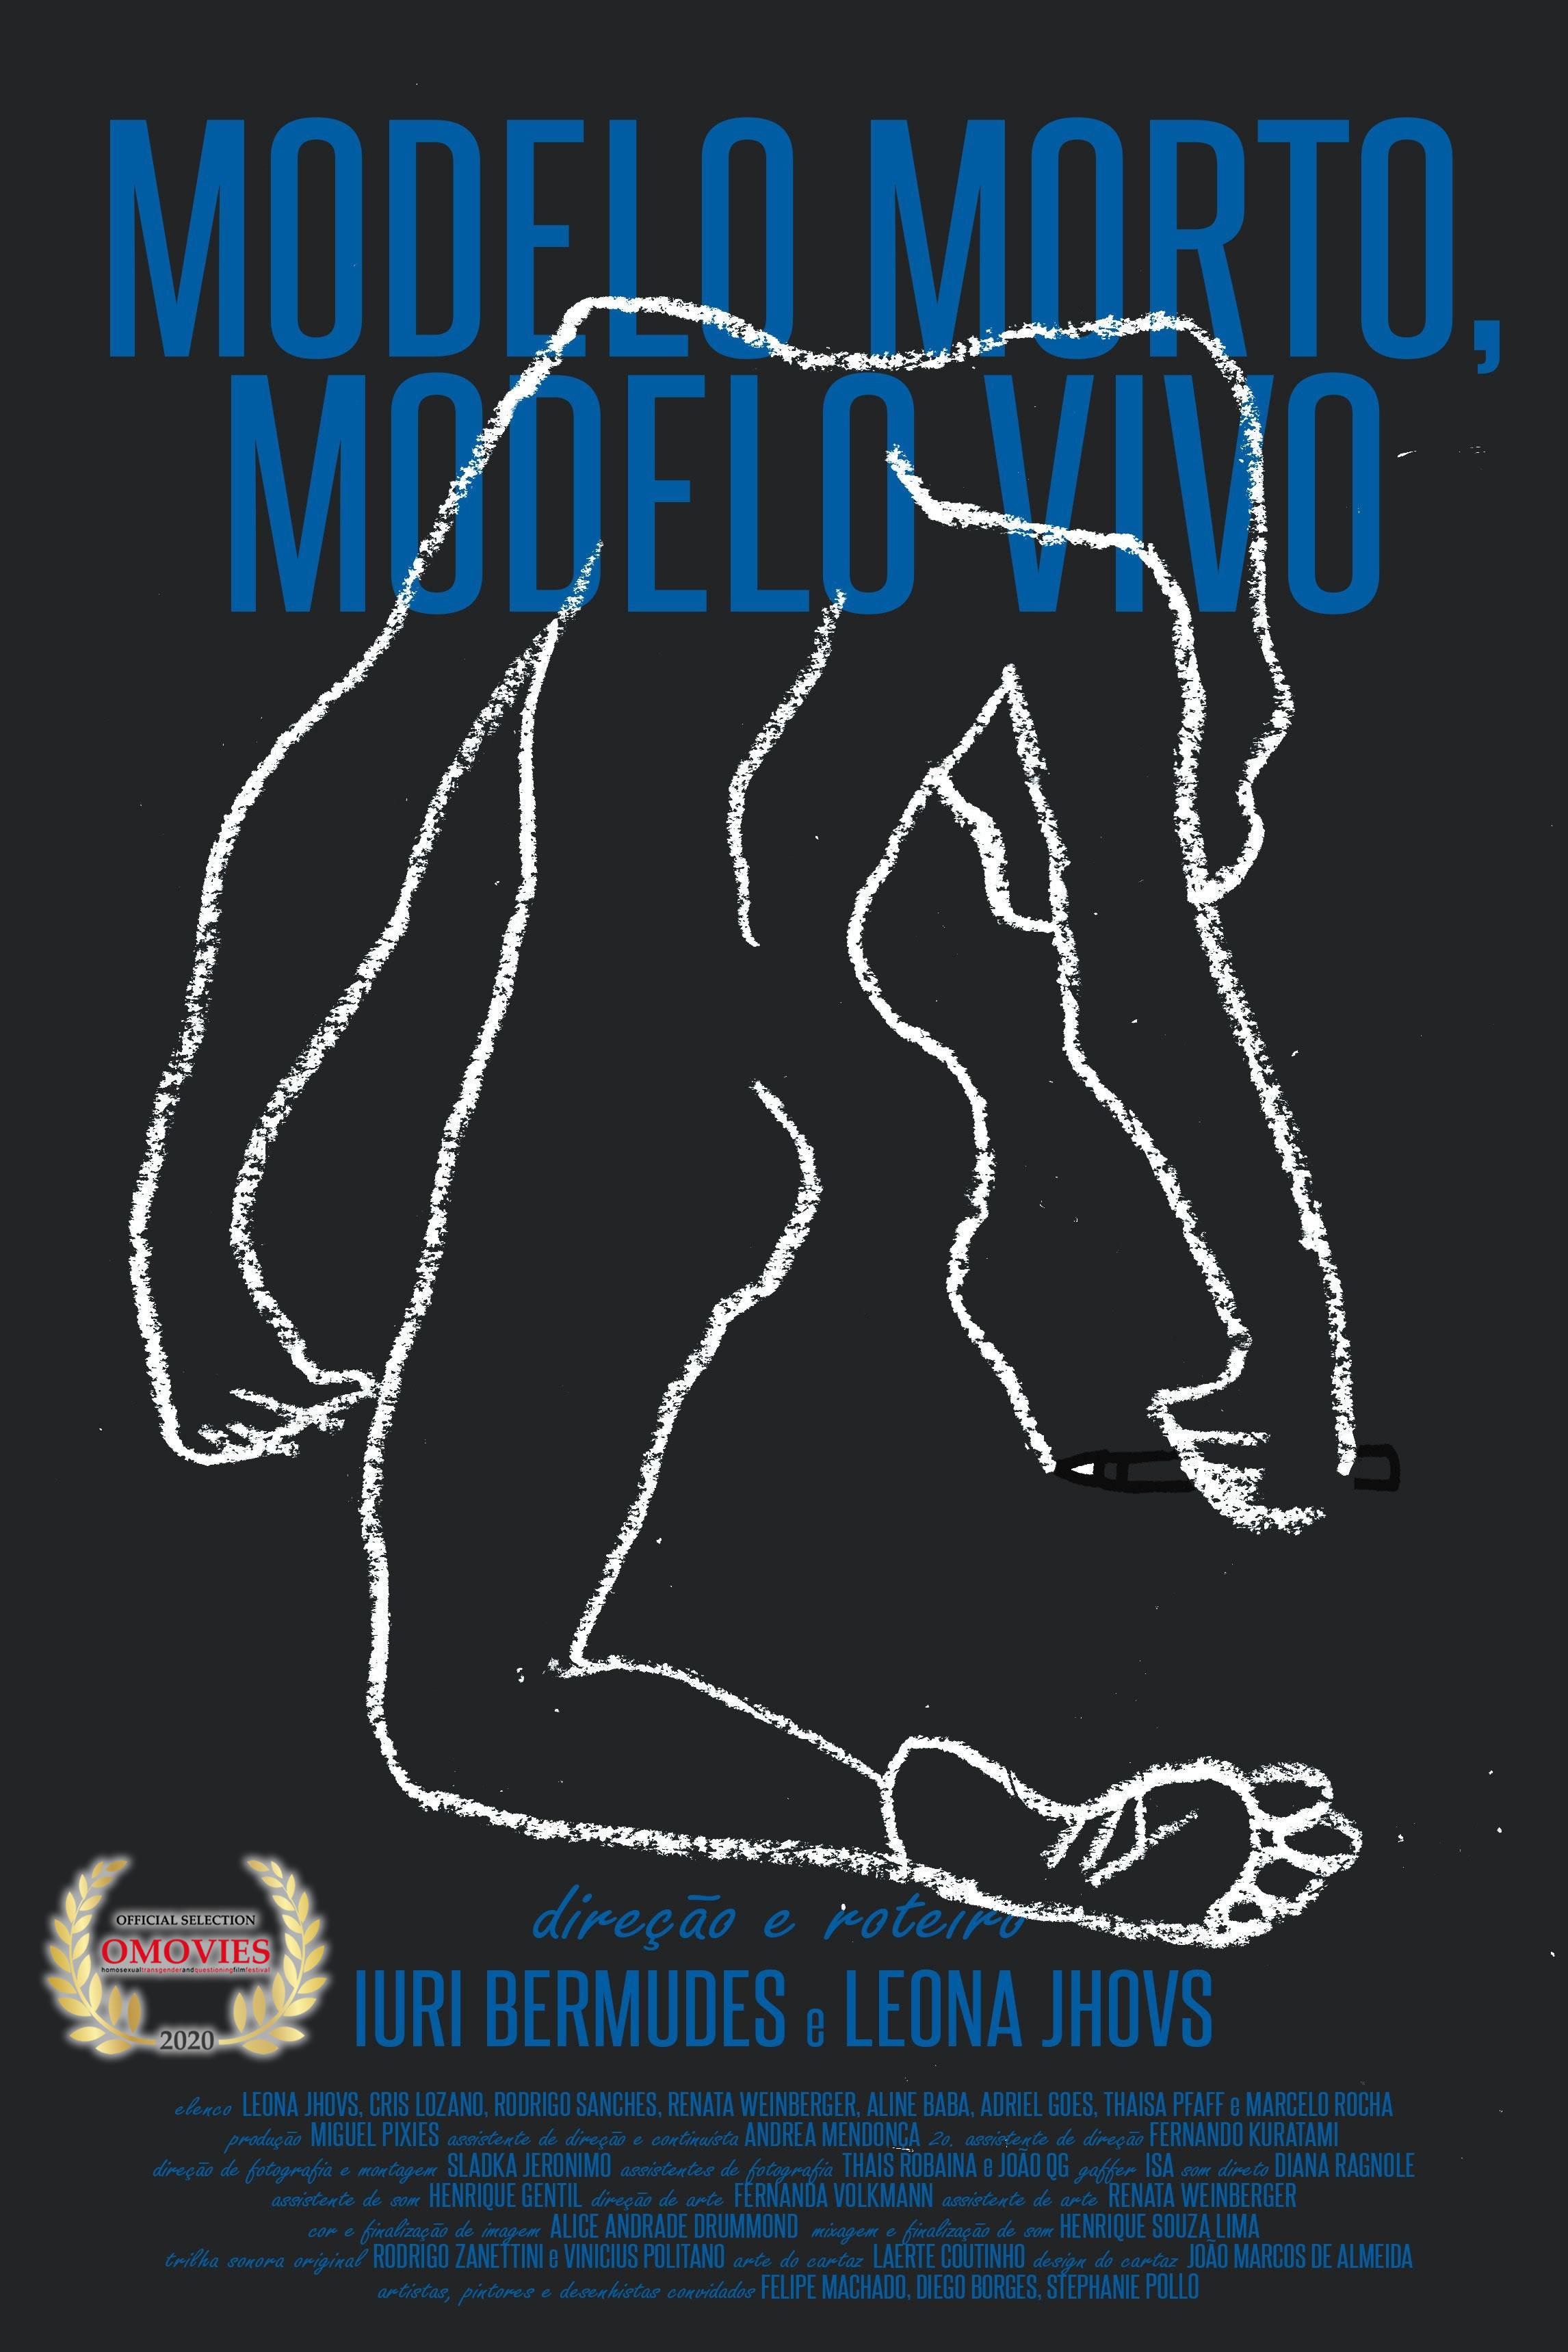 Modelo Morto, Modelo Vivo – DirectorLuri Bermudes – Leona Jhovs Dec 22